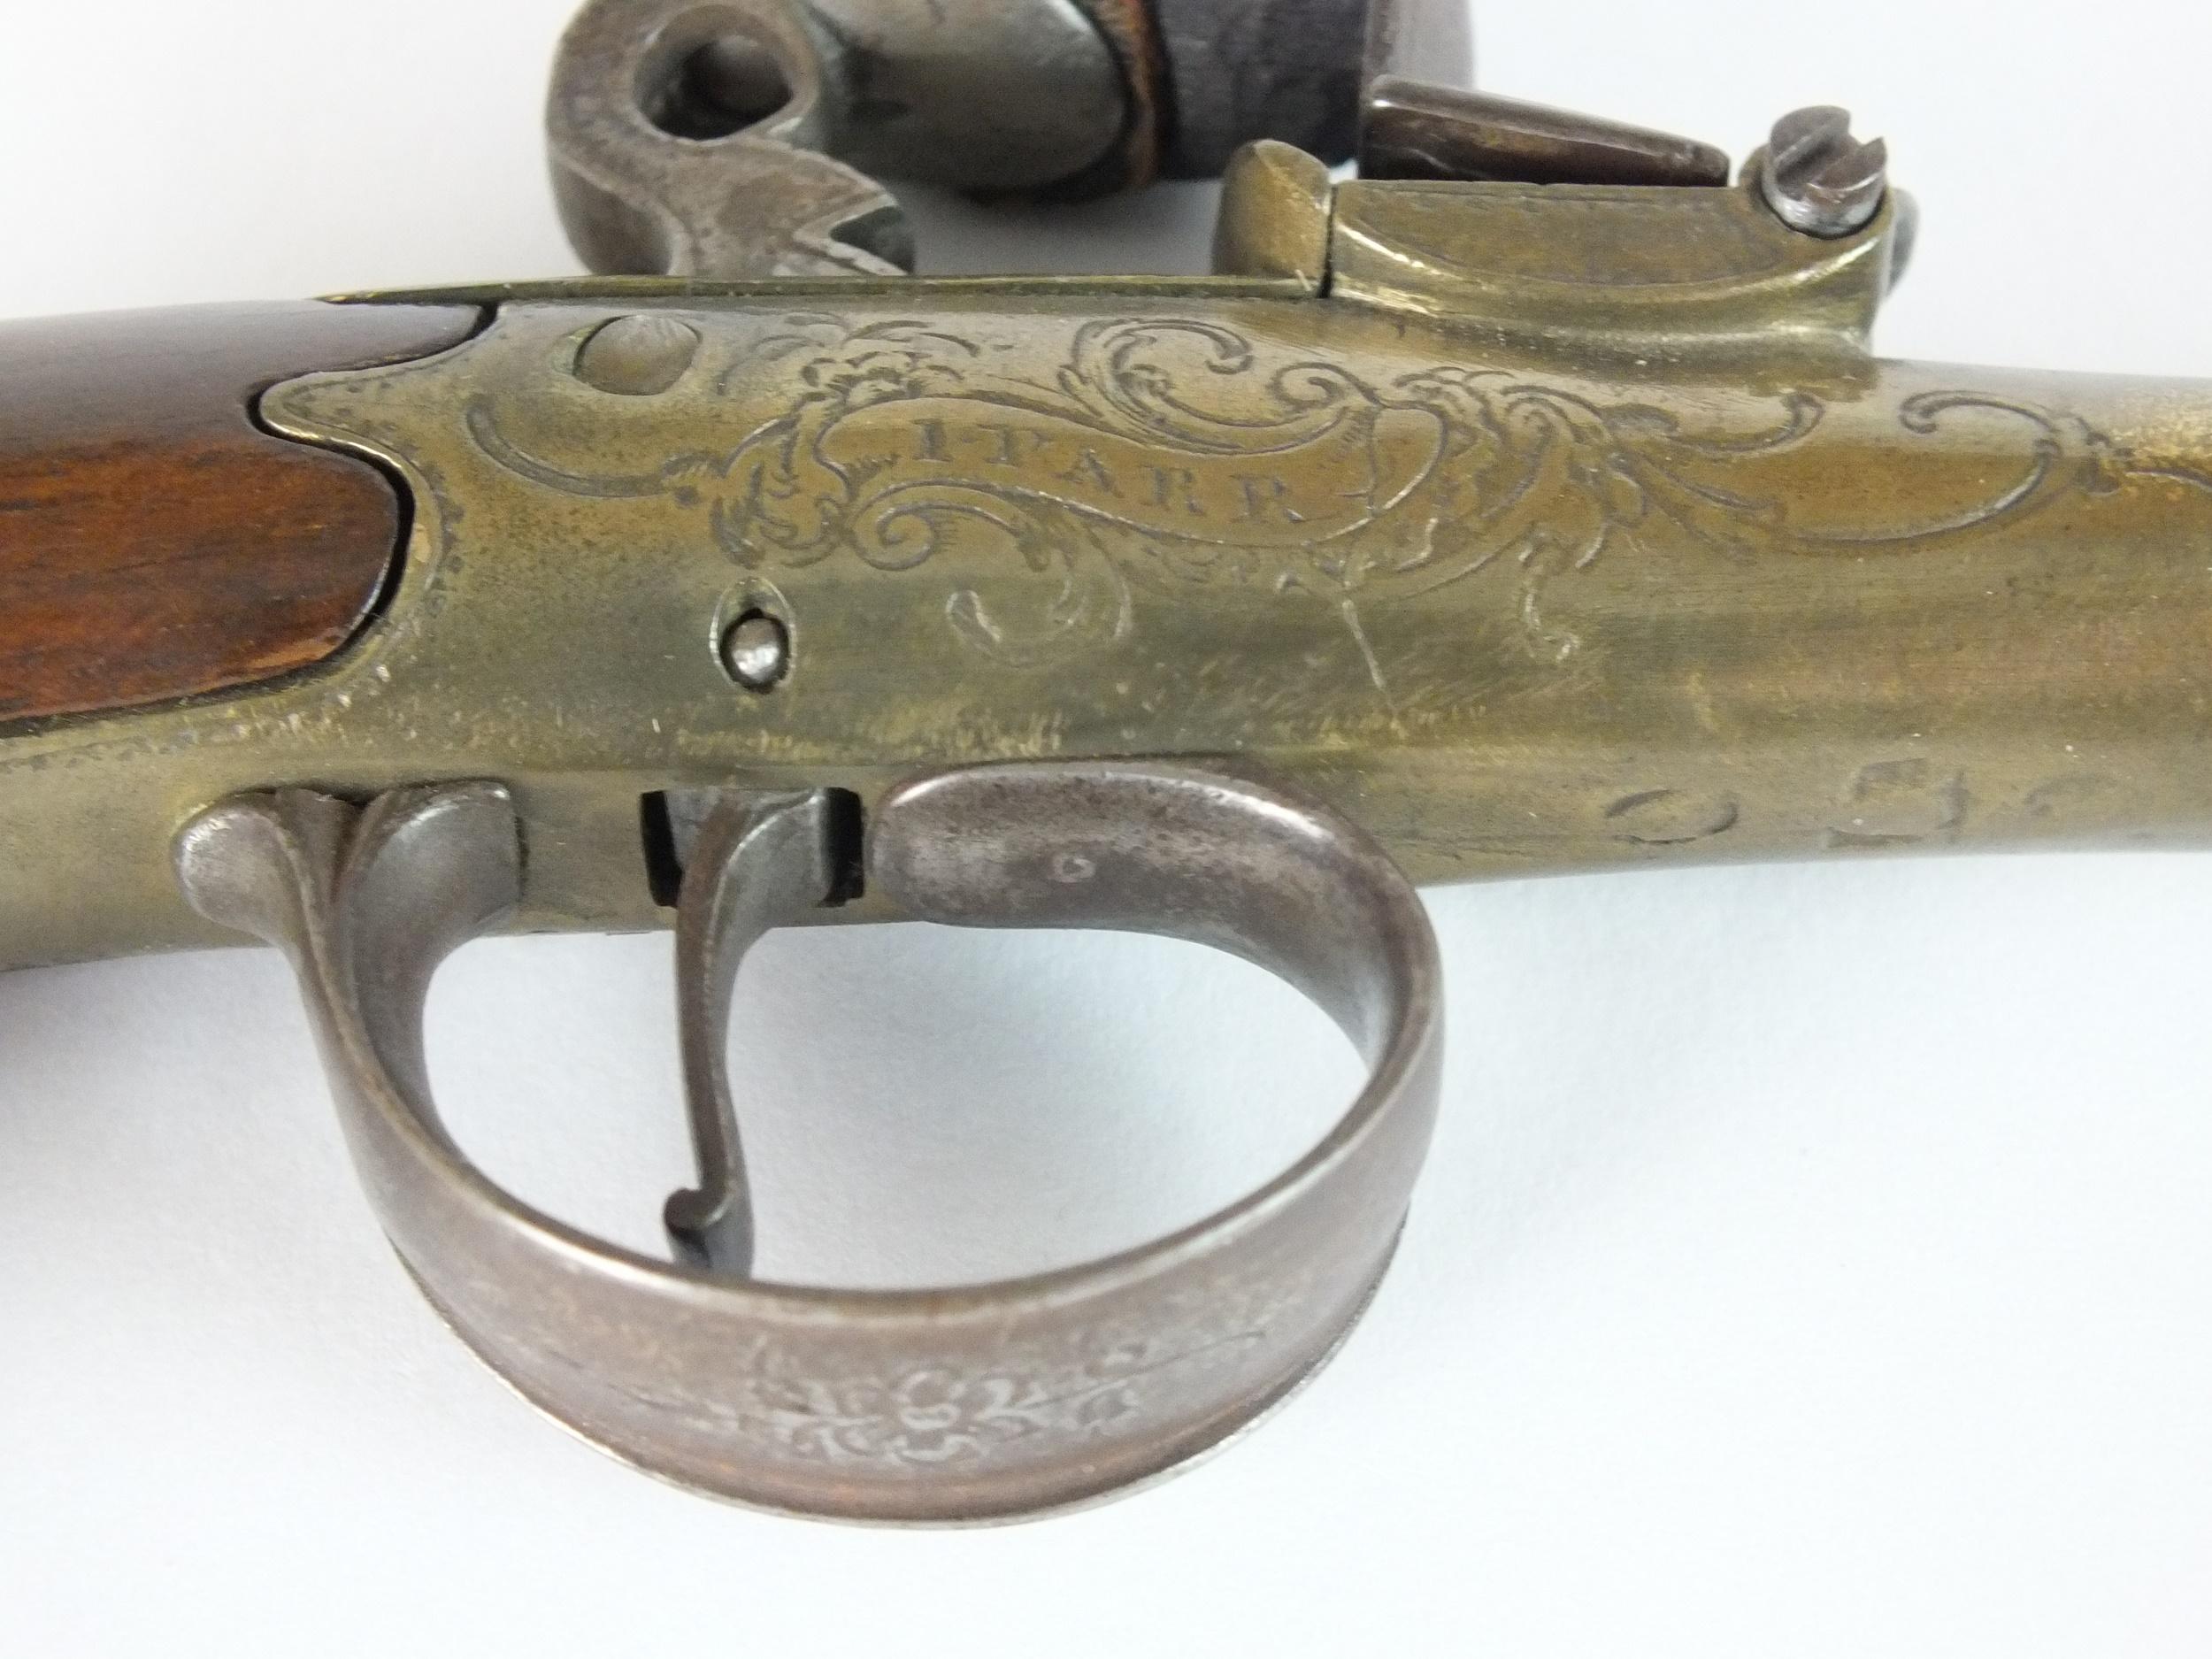 An English flintlock 'Queen Anne' pistol - Image 2 of 5